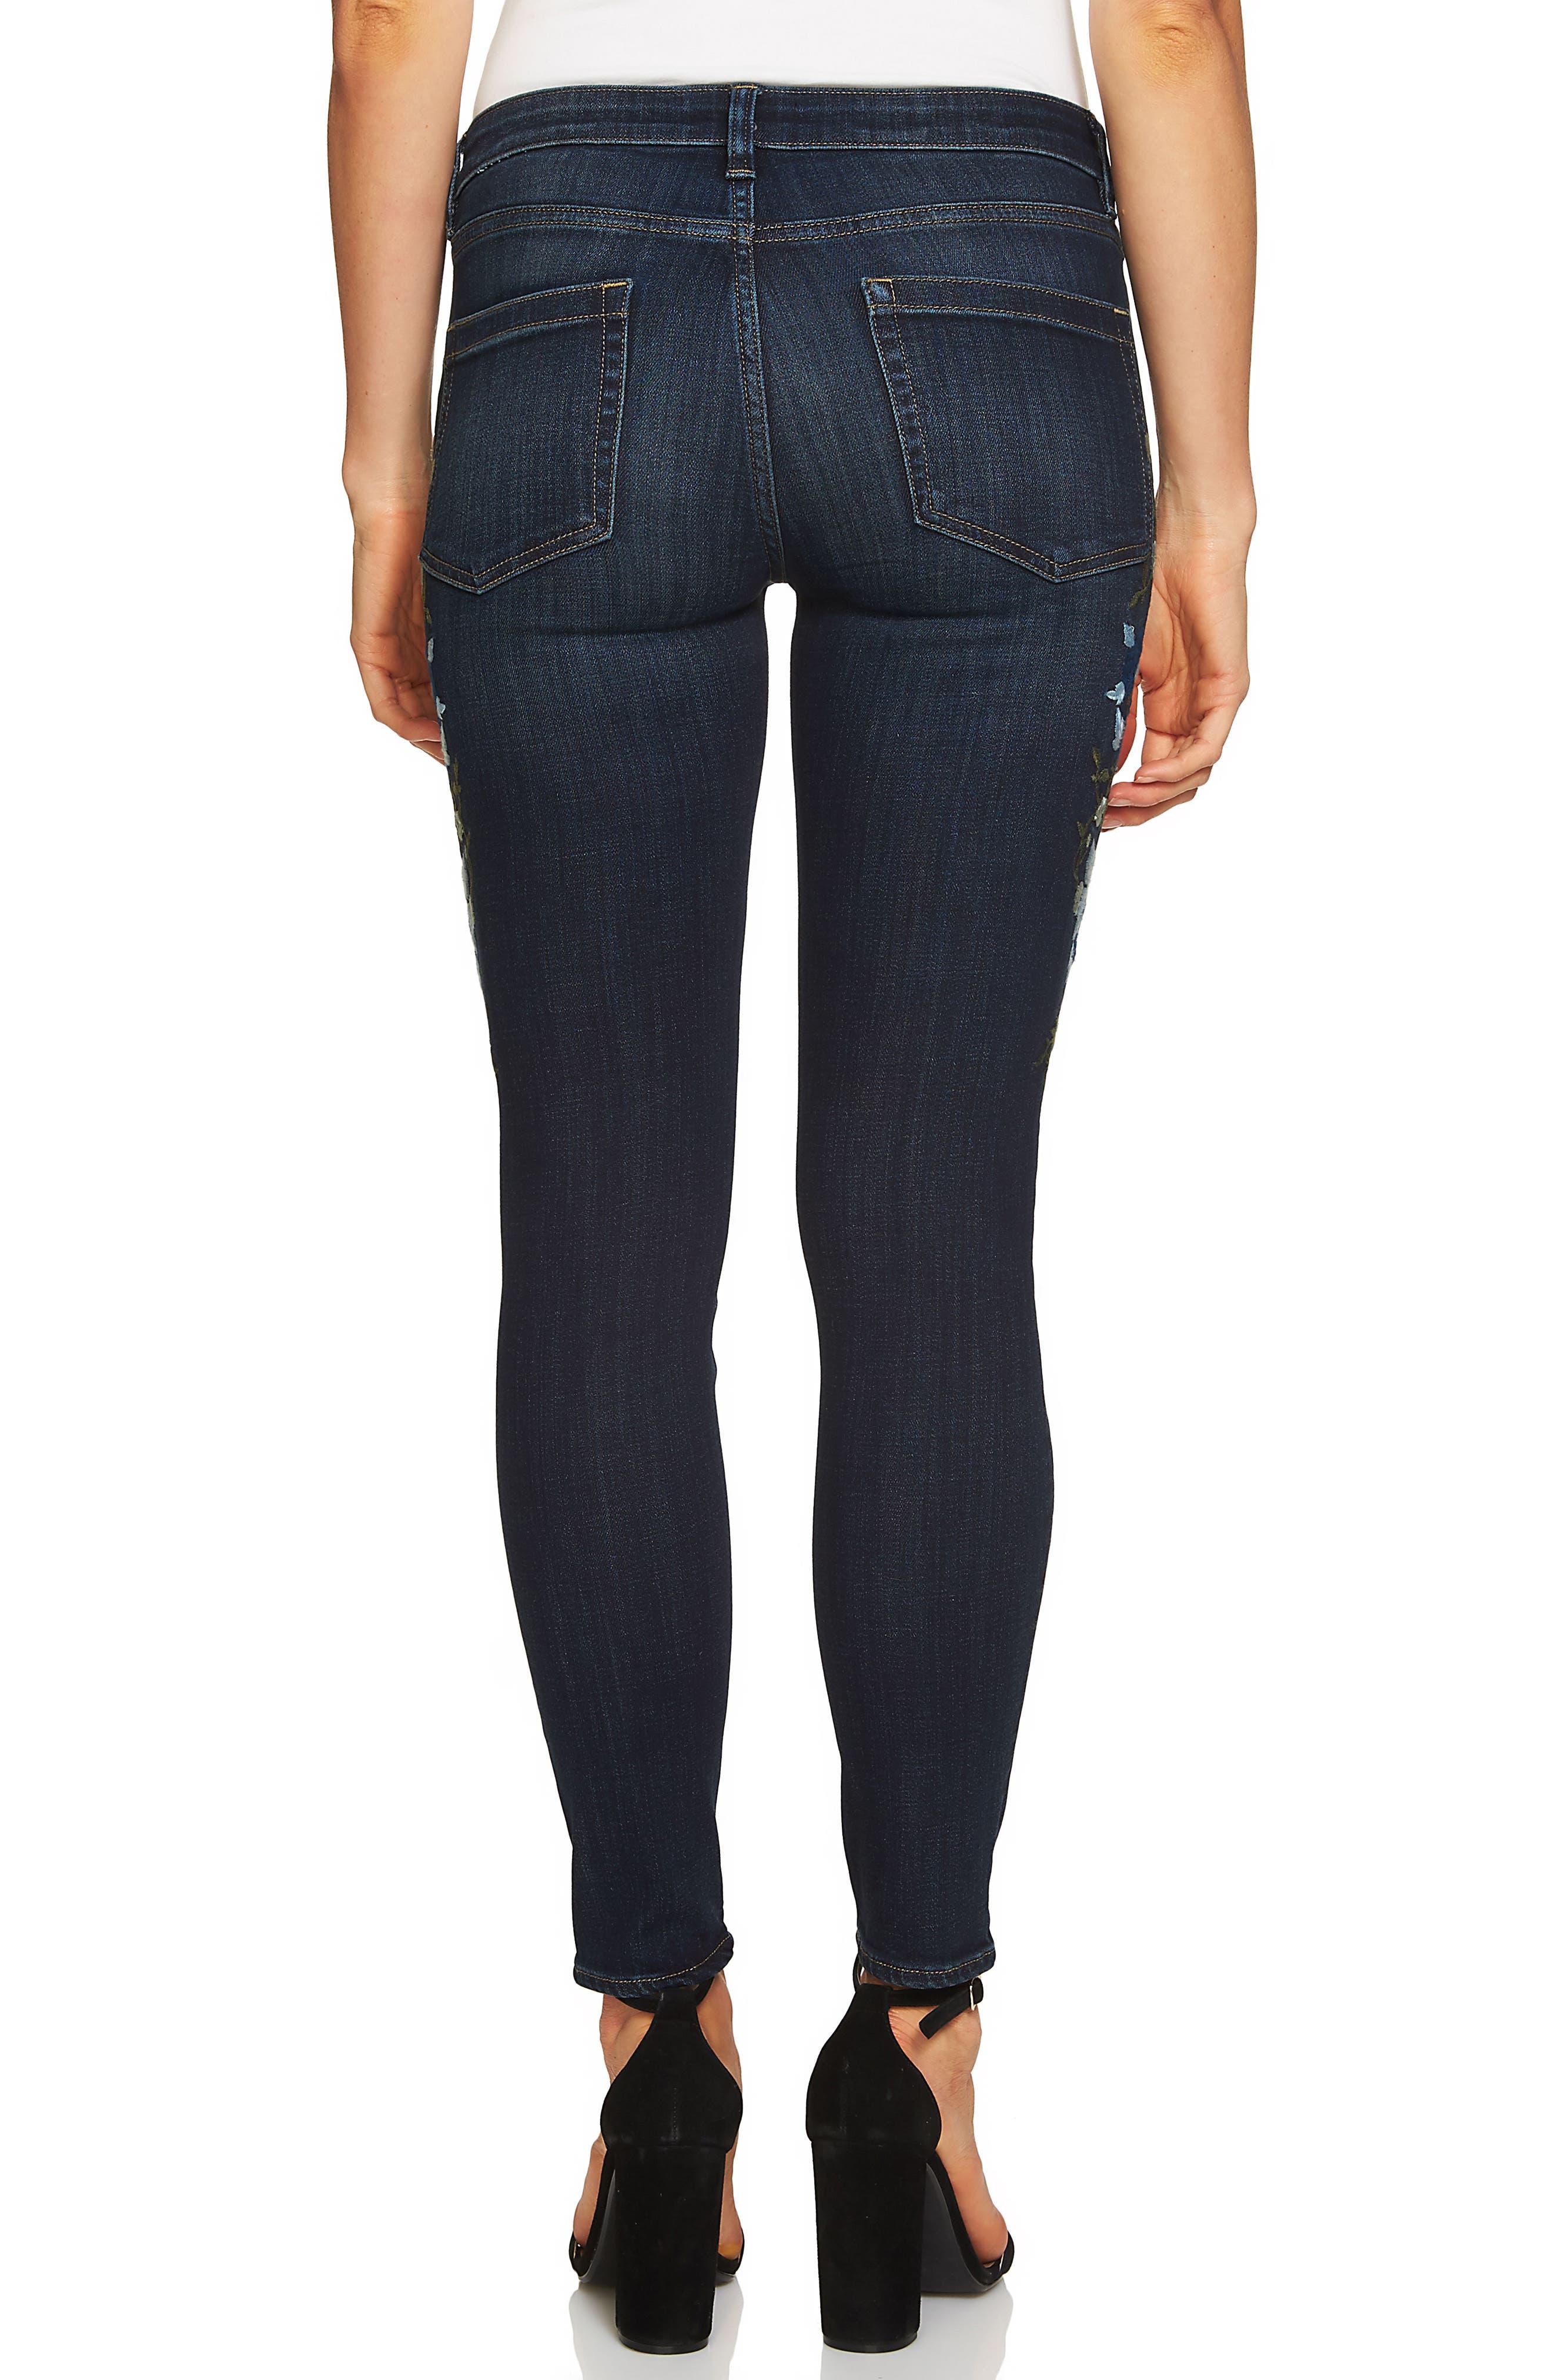 Indigo Denim Floral Embroidered Jeans,                             Alternate thumbnail 2, color,                             Dark Authentic Blue